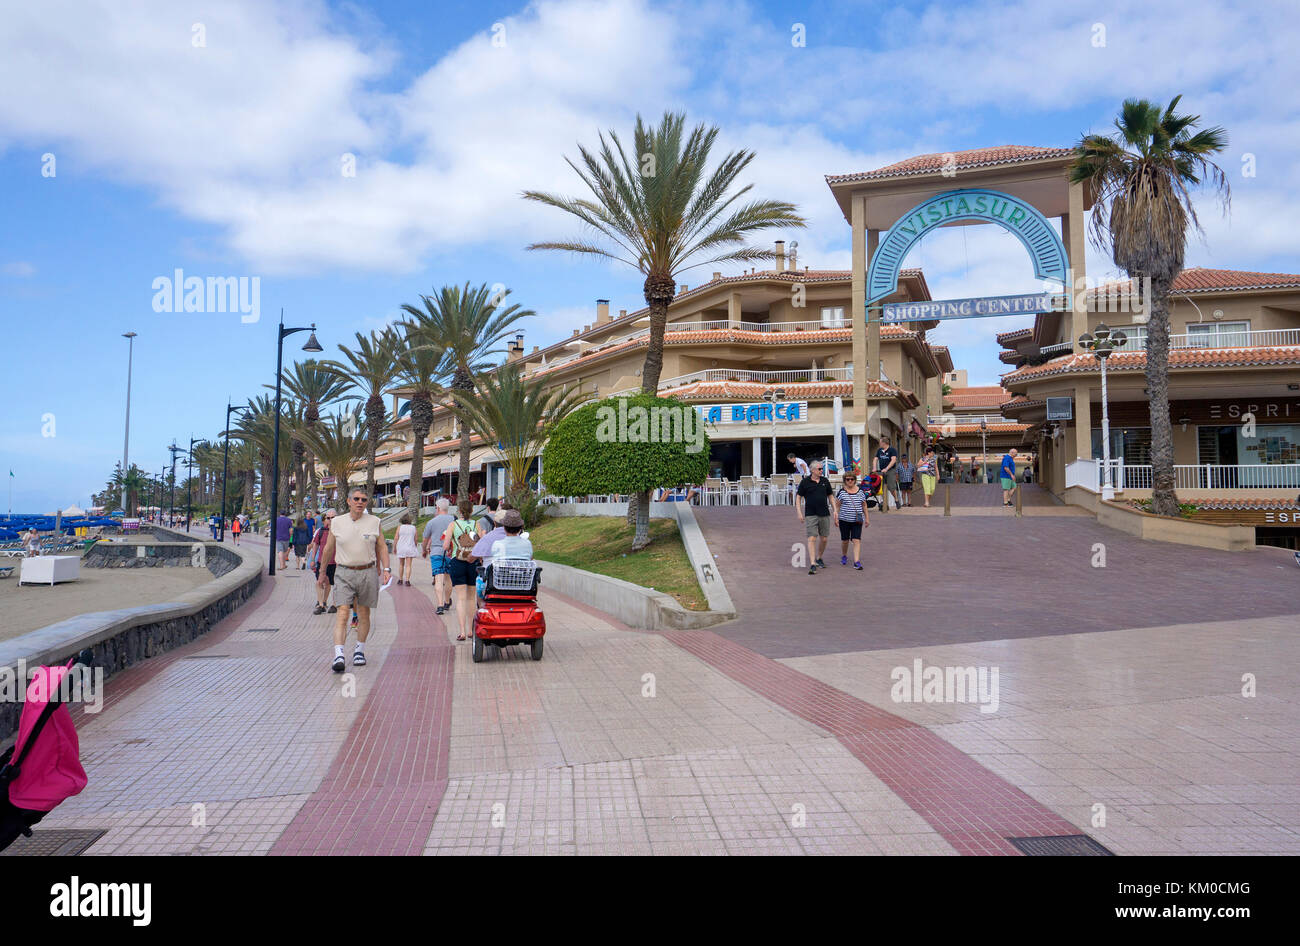 Shopping Center Vista Sud at the promenade of Los Christianos, South coast of Tenerife island, Canary islands, Spain - Stock Image